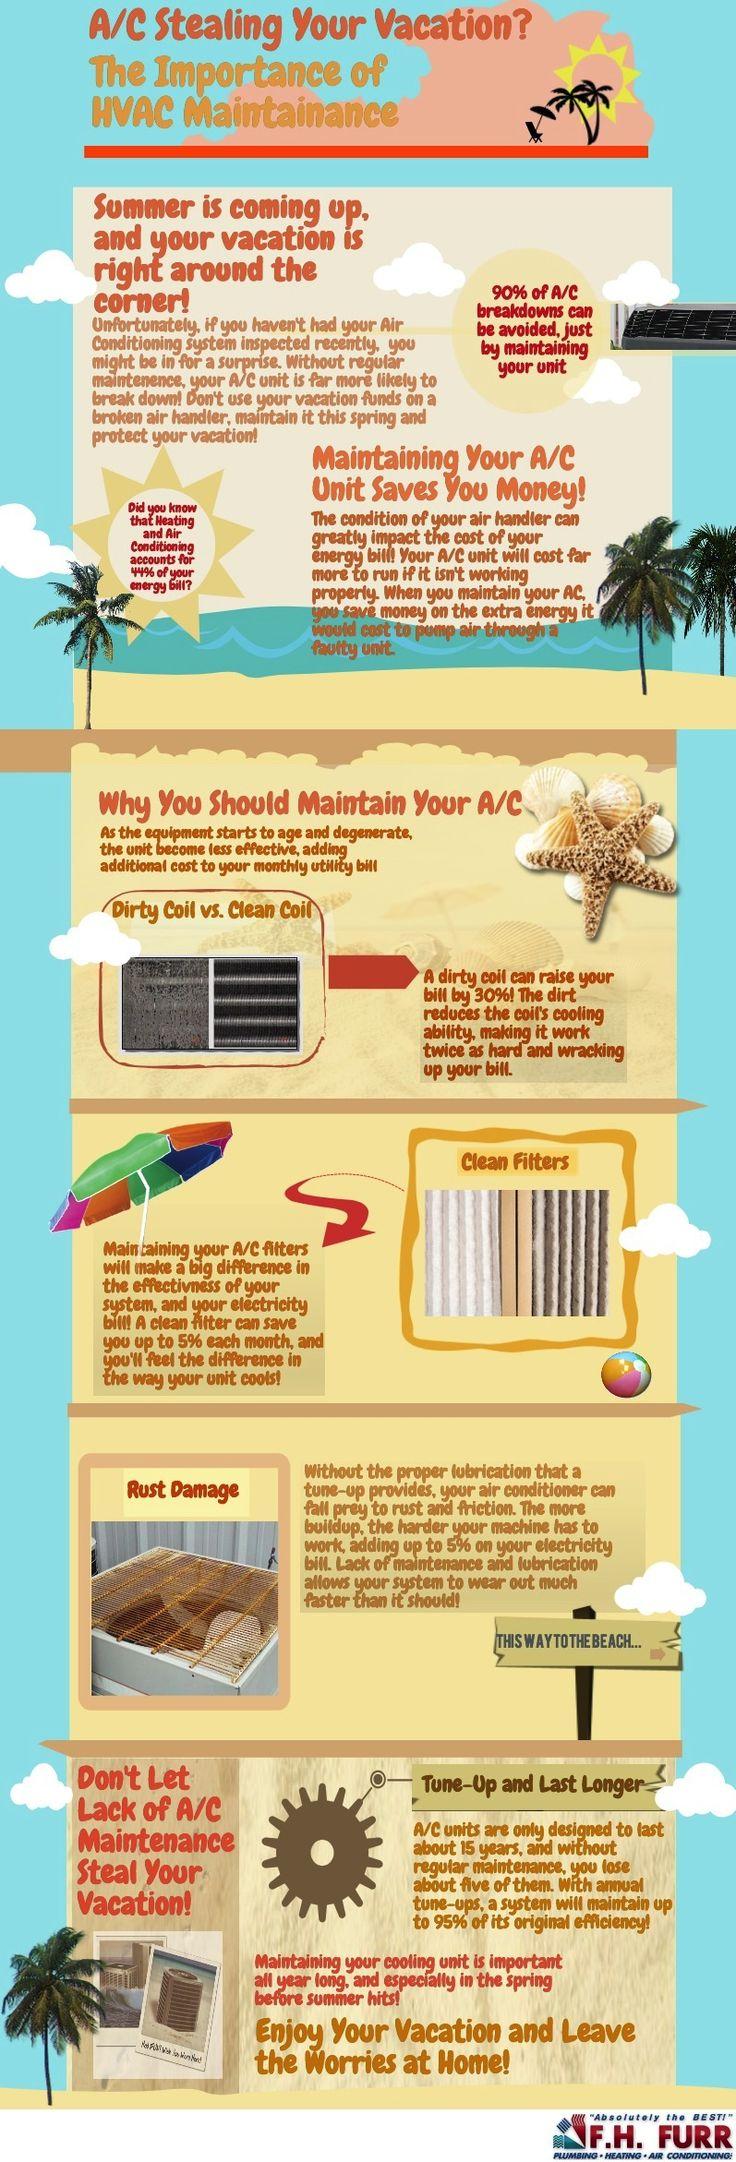 The Importance of HVAC Maintenance brewercommercialservices.com